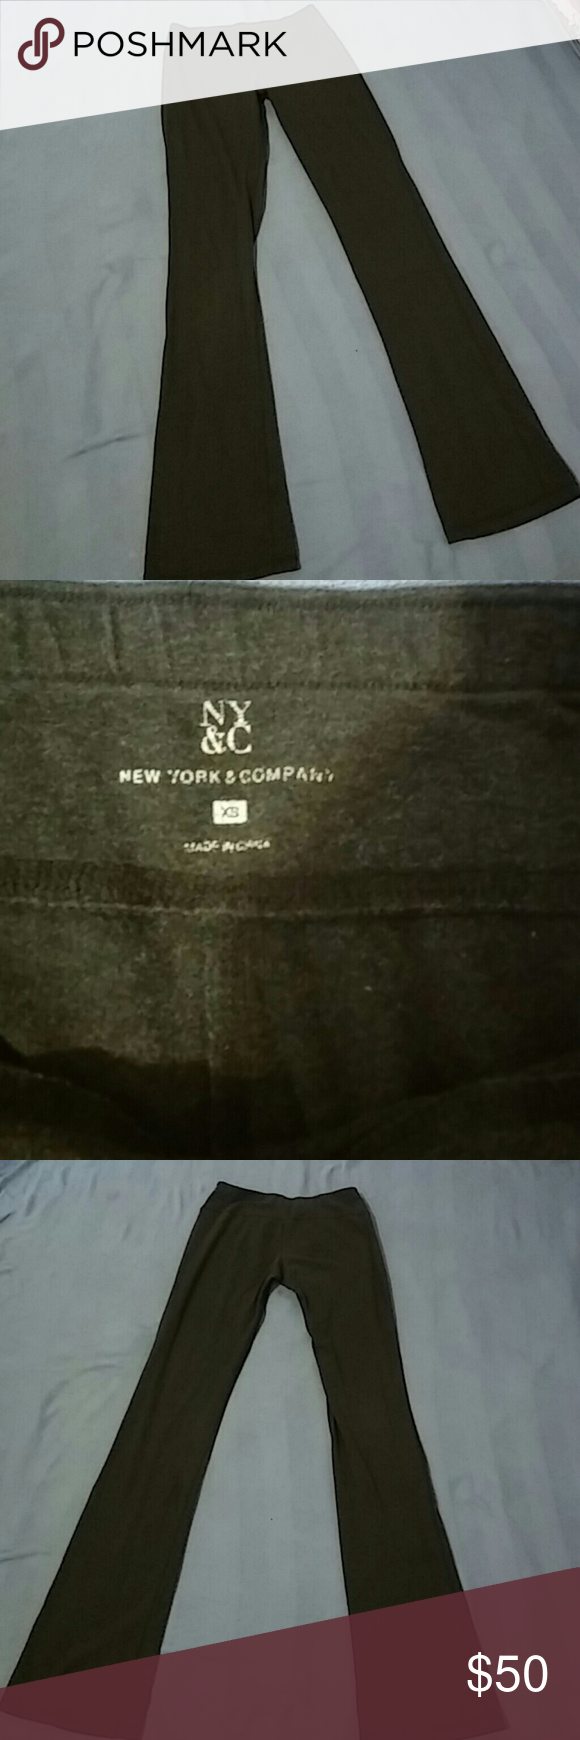 New York Company Pants xSmall (xS) Sport Yoga Stretchy tall xs pants grey verry comfy? New York & Company Pants